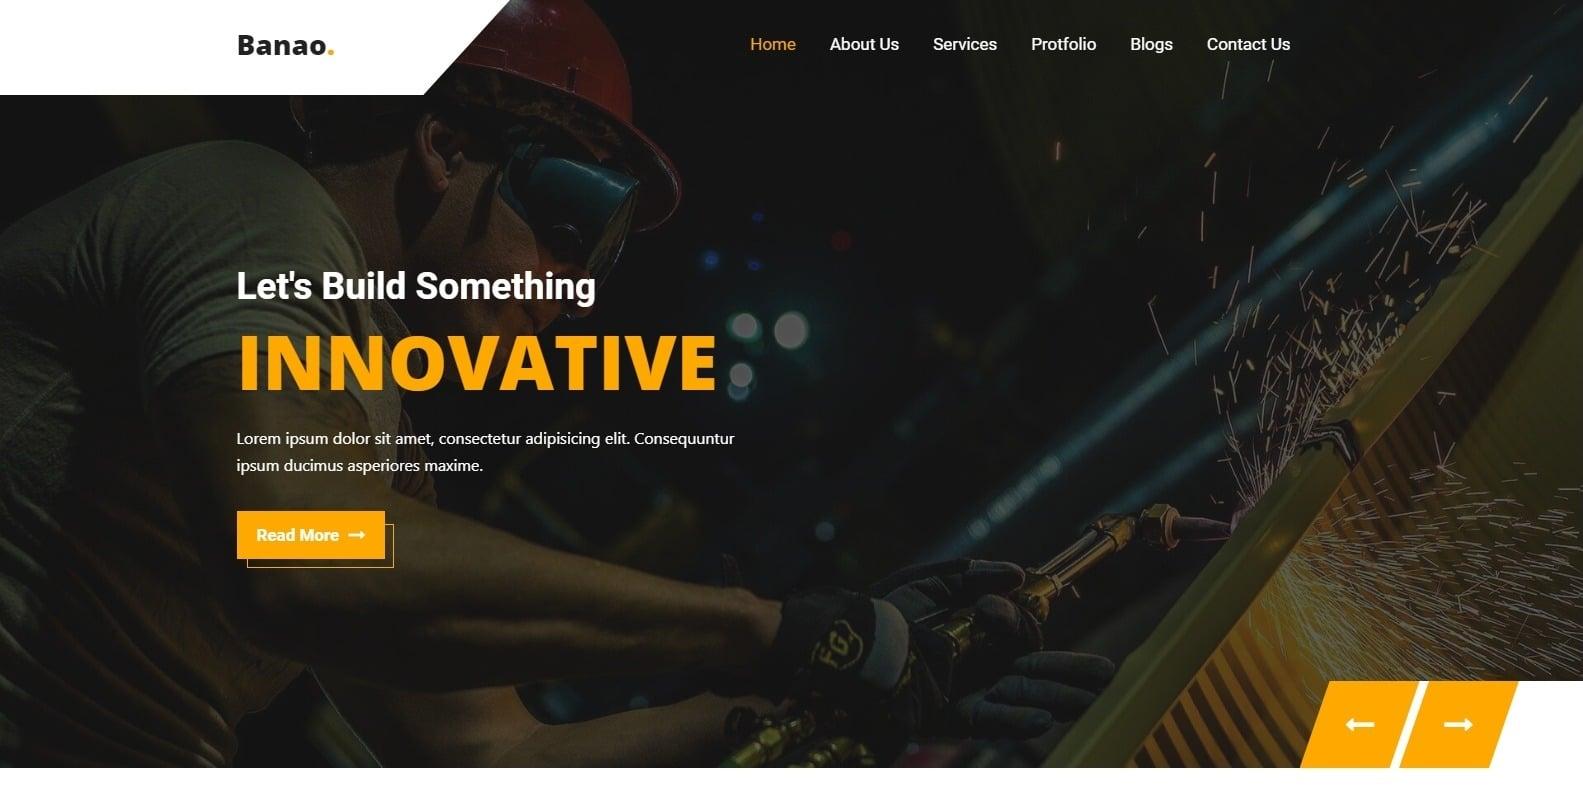 banao-construction-website-template